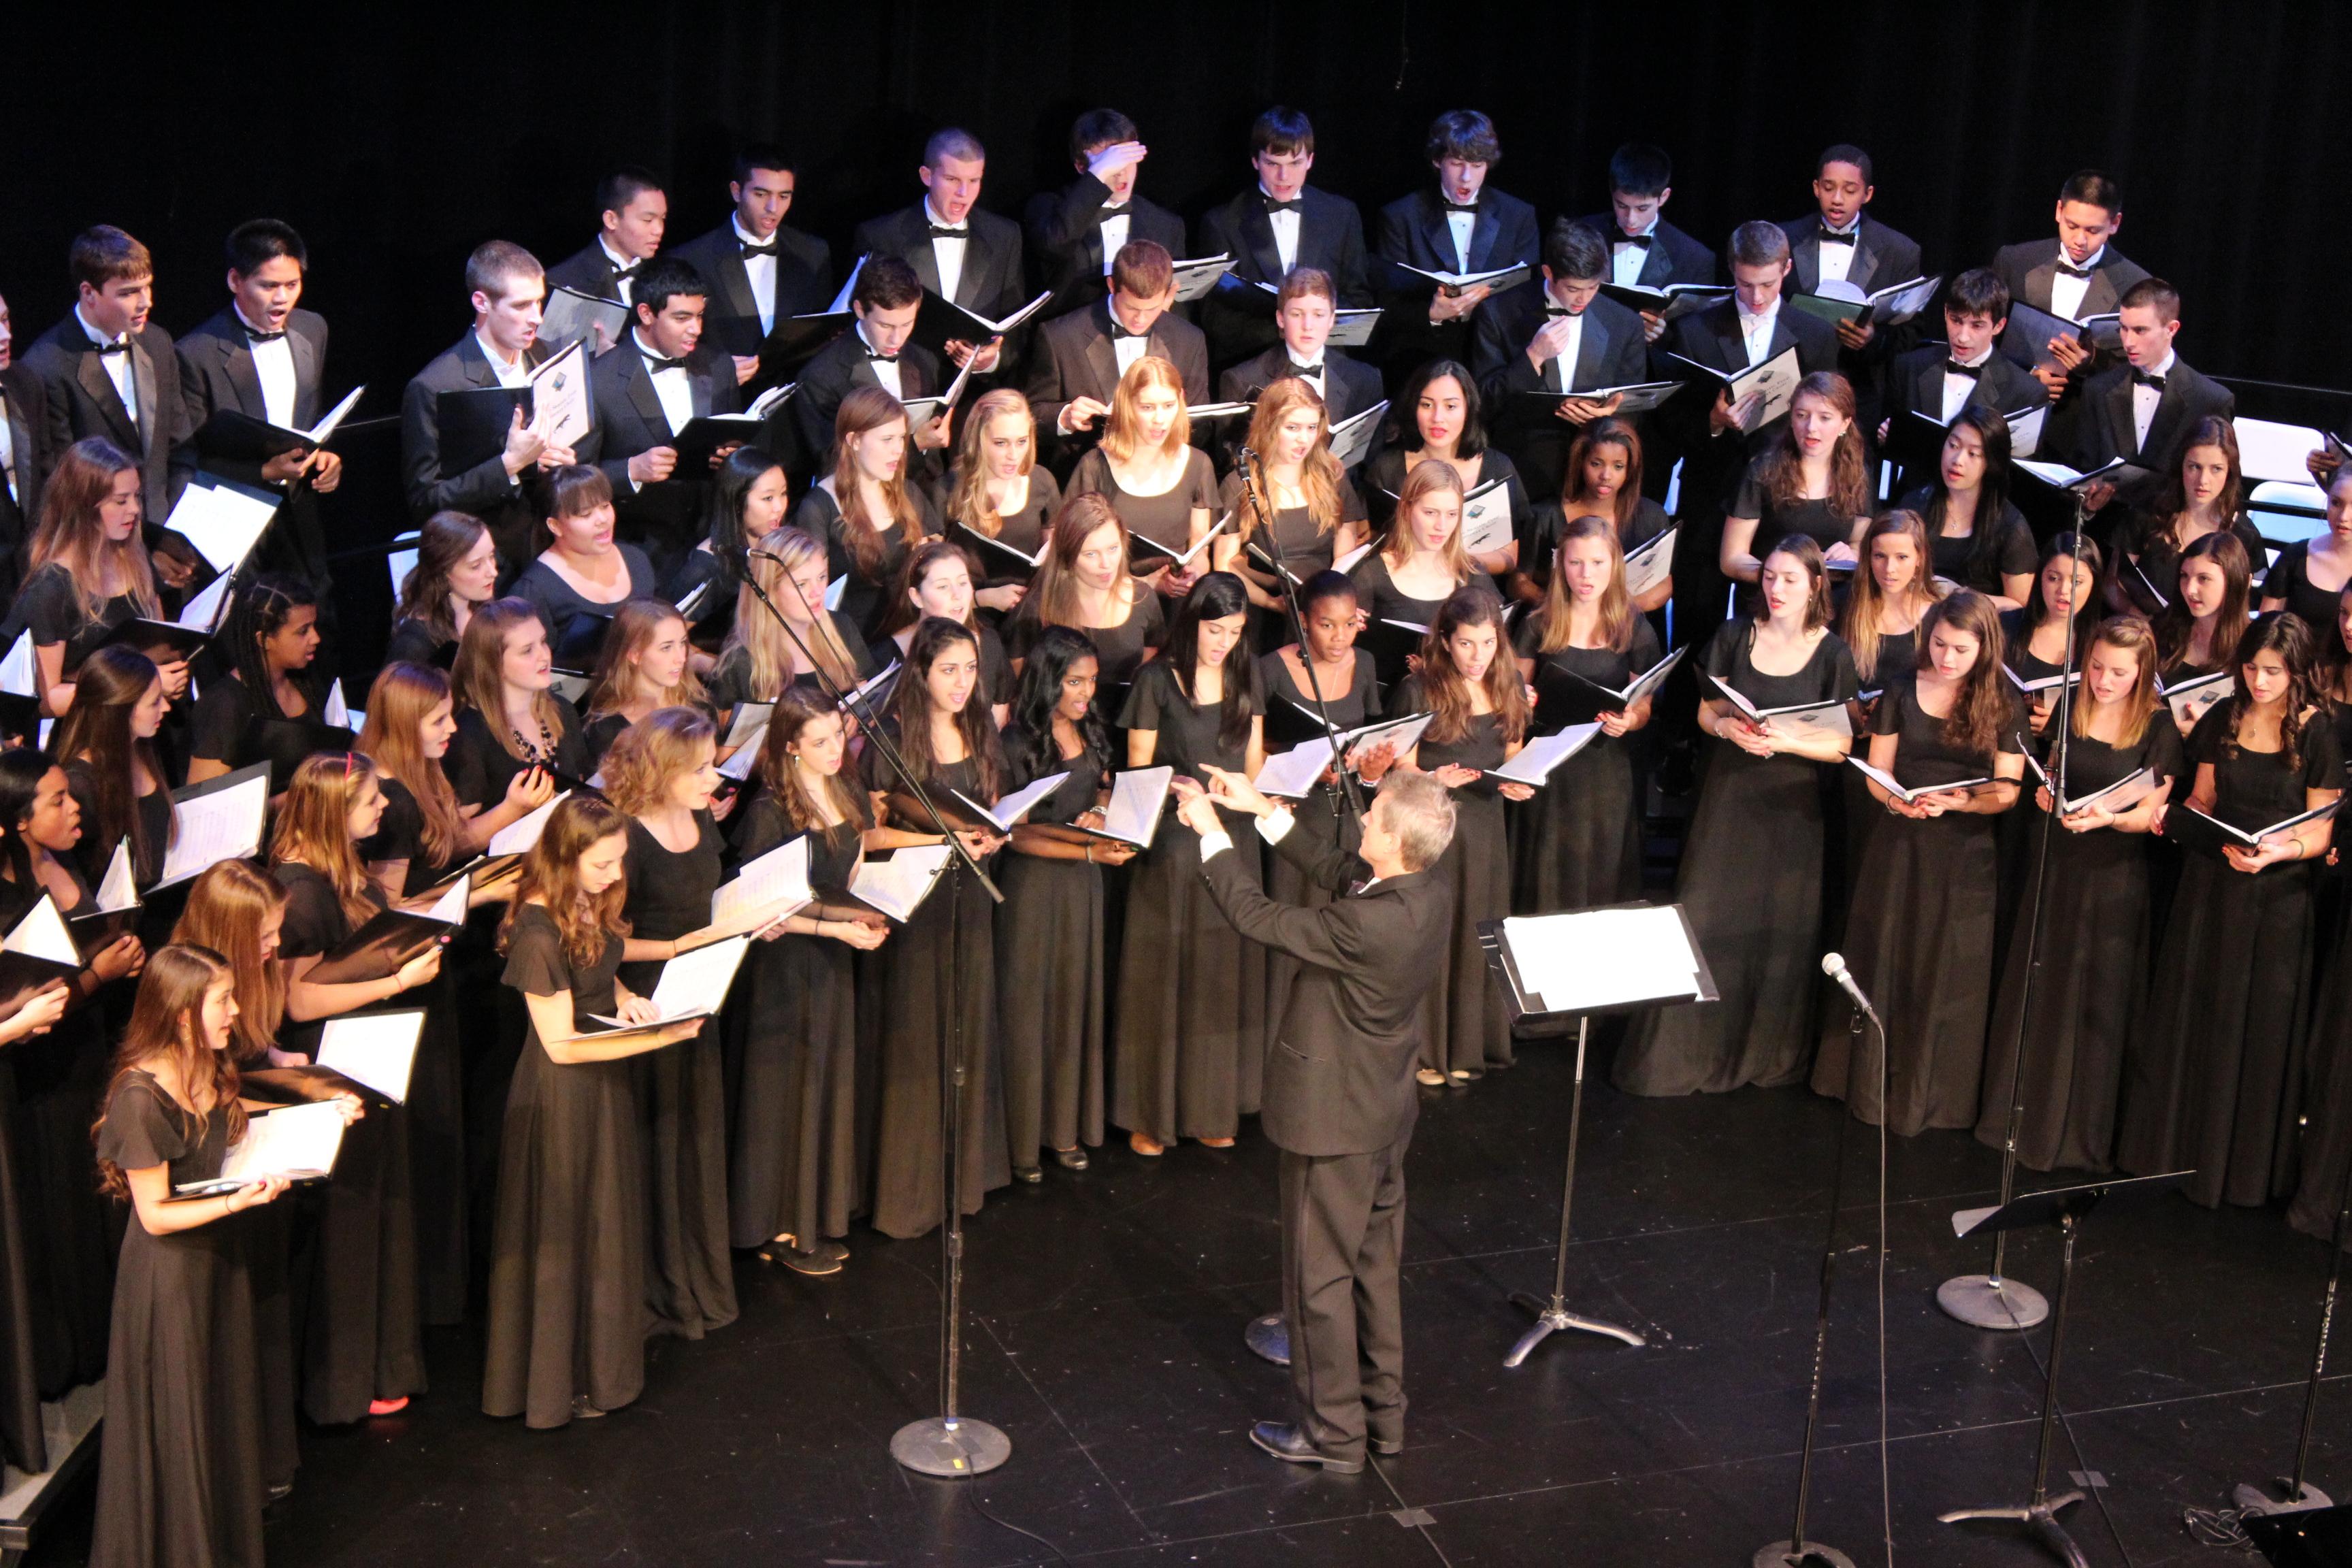 national childrens choir performance - HD3456×2304